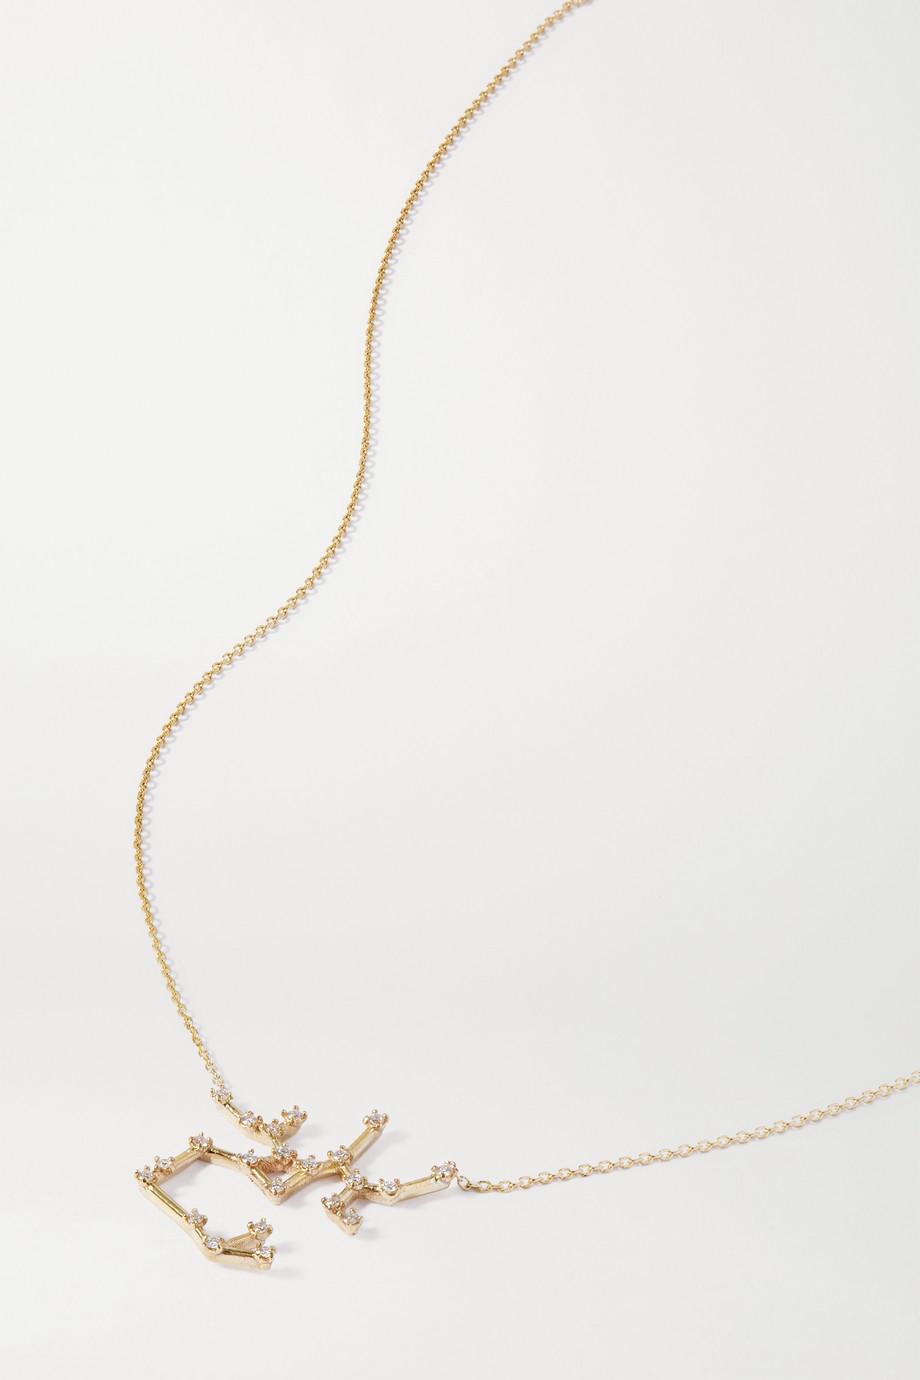 SARAH & SEBASTIAN Celestial Sagittarius 10-karat gold diamond necklace